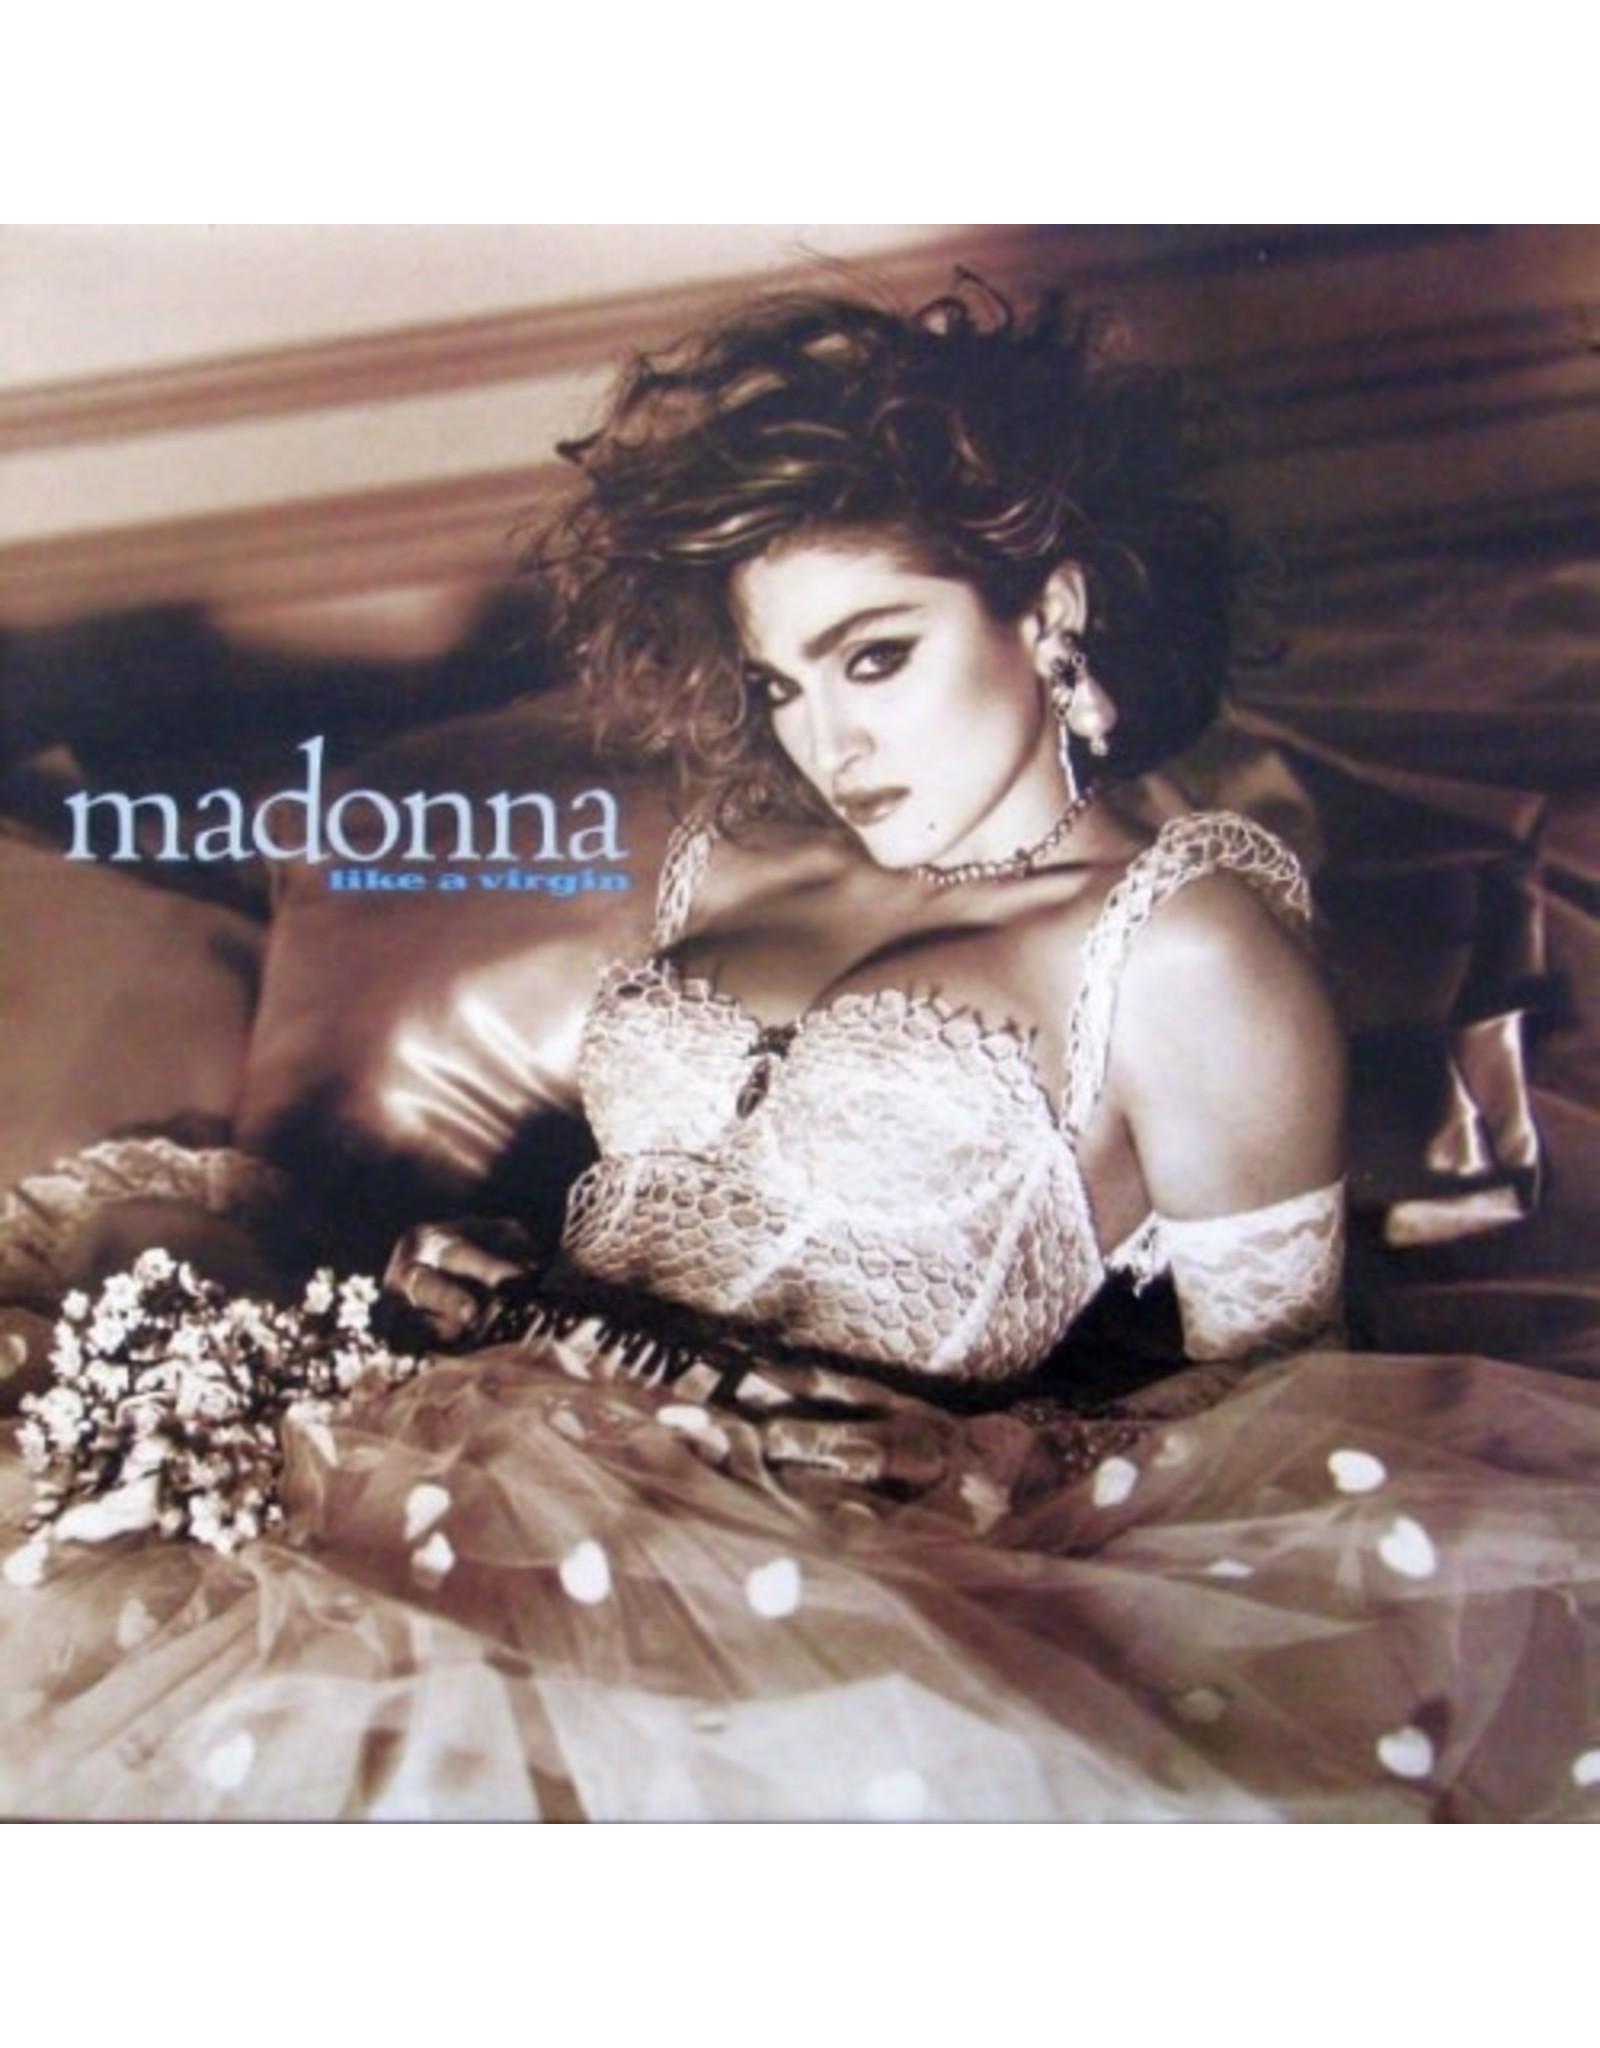 Madonna - Like A Virgin (White Vinyl)